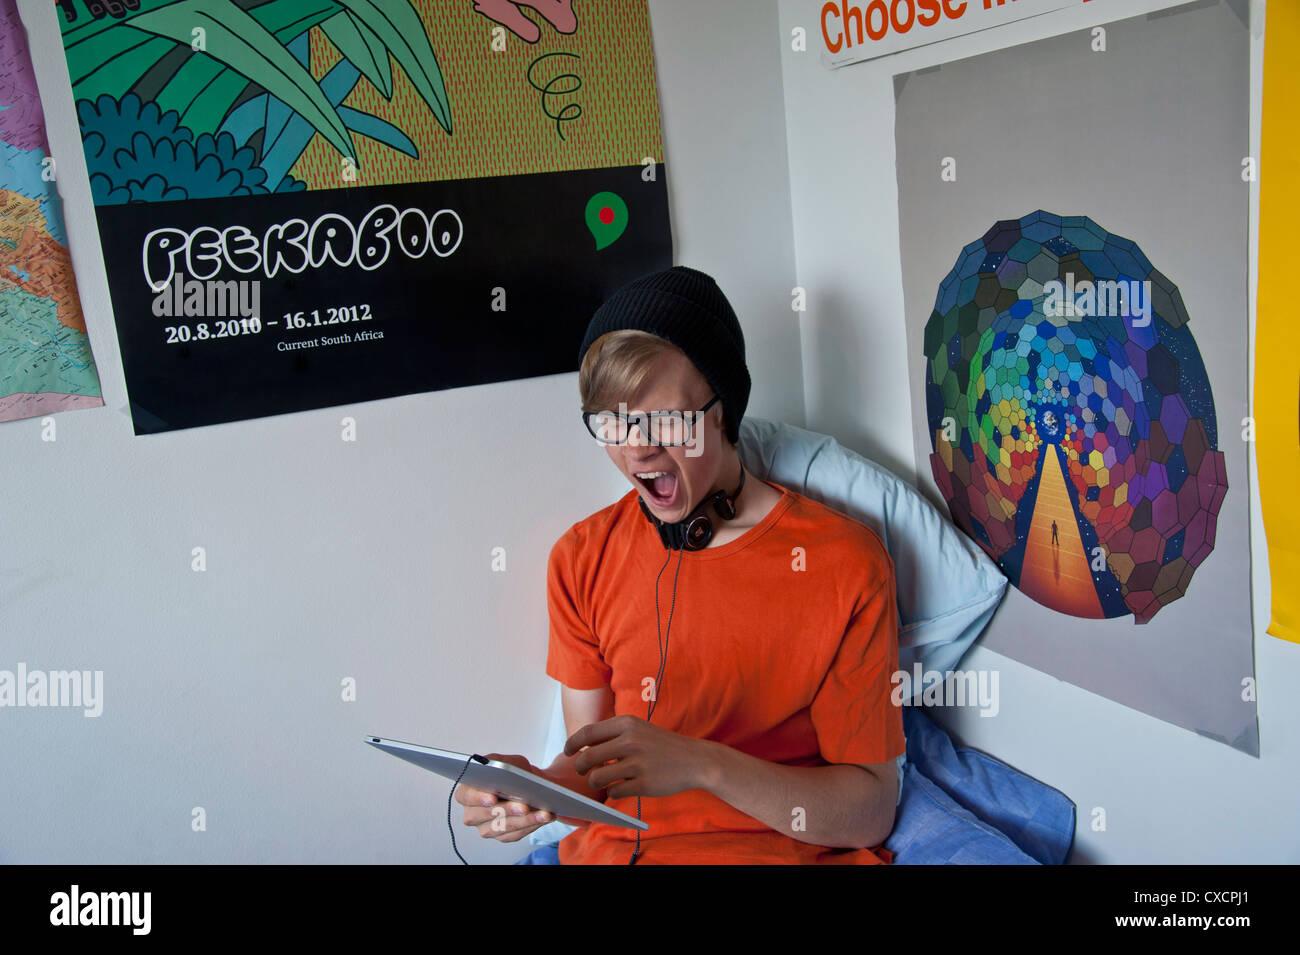 Yawning teenage boy with iPad tablet computer in his bedroom during his school exam studies - Stock Image